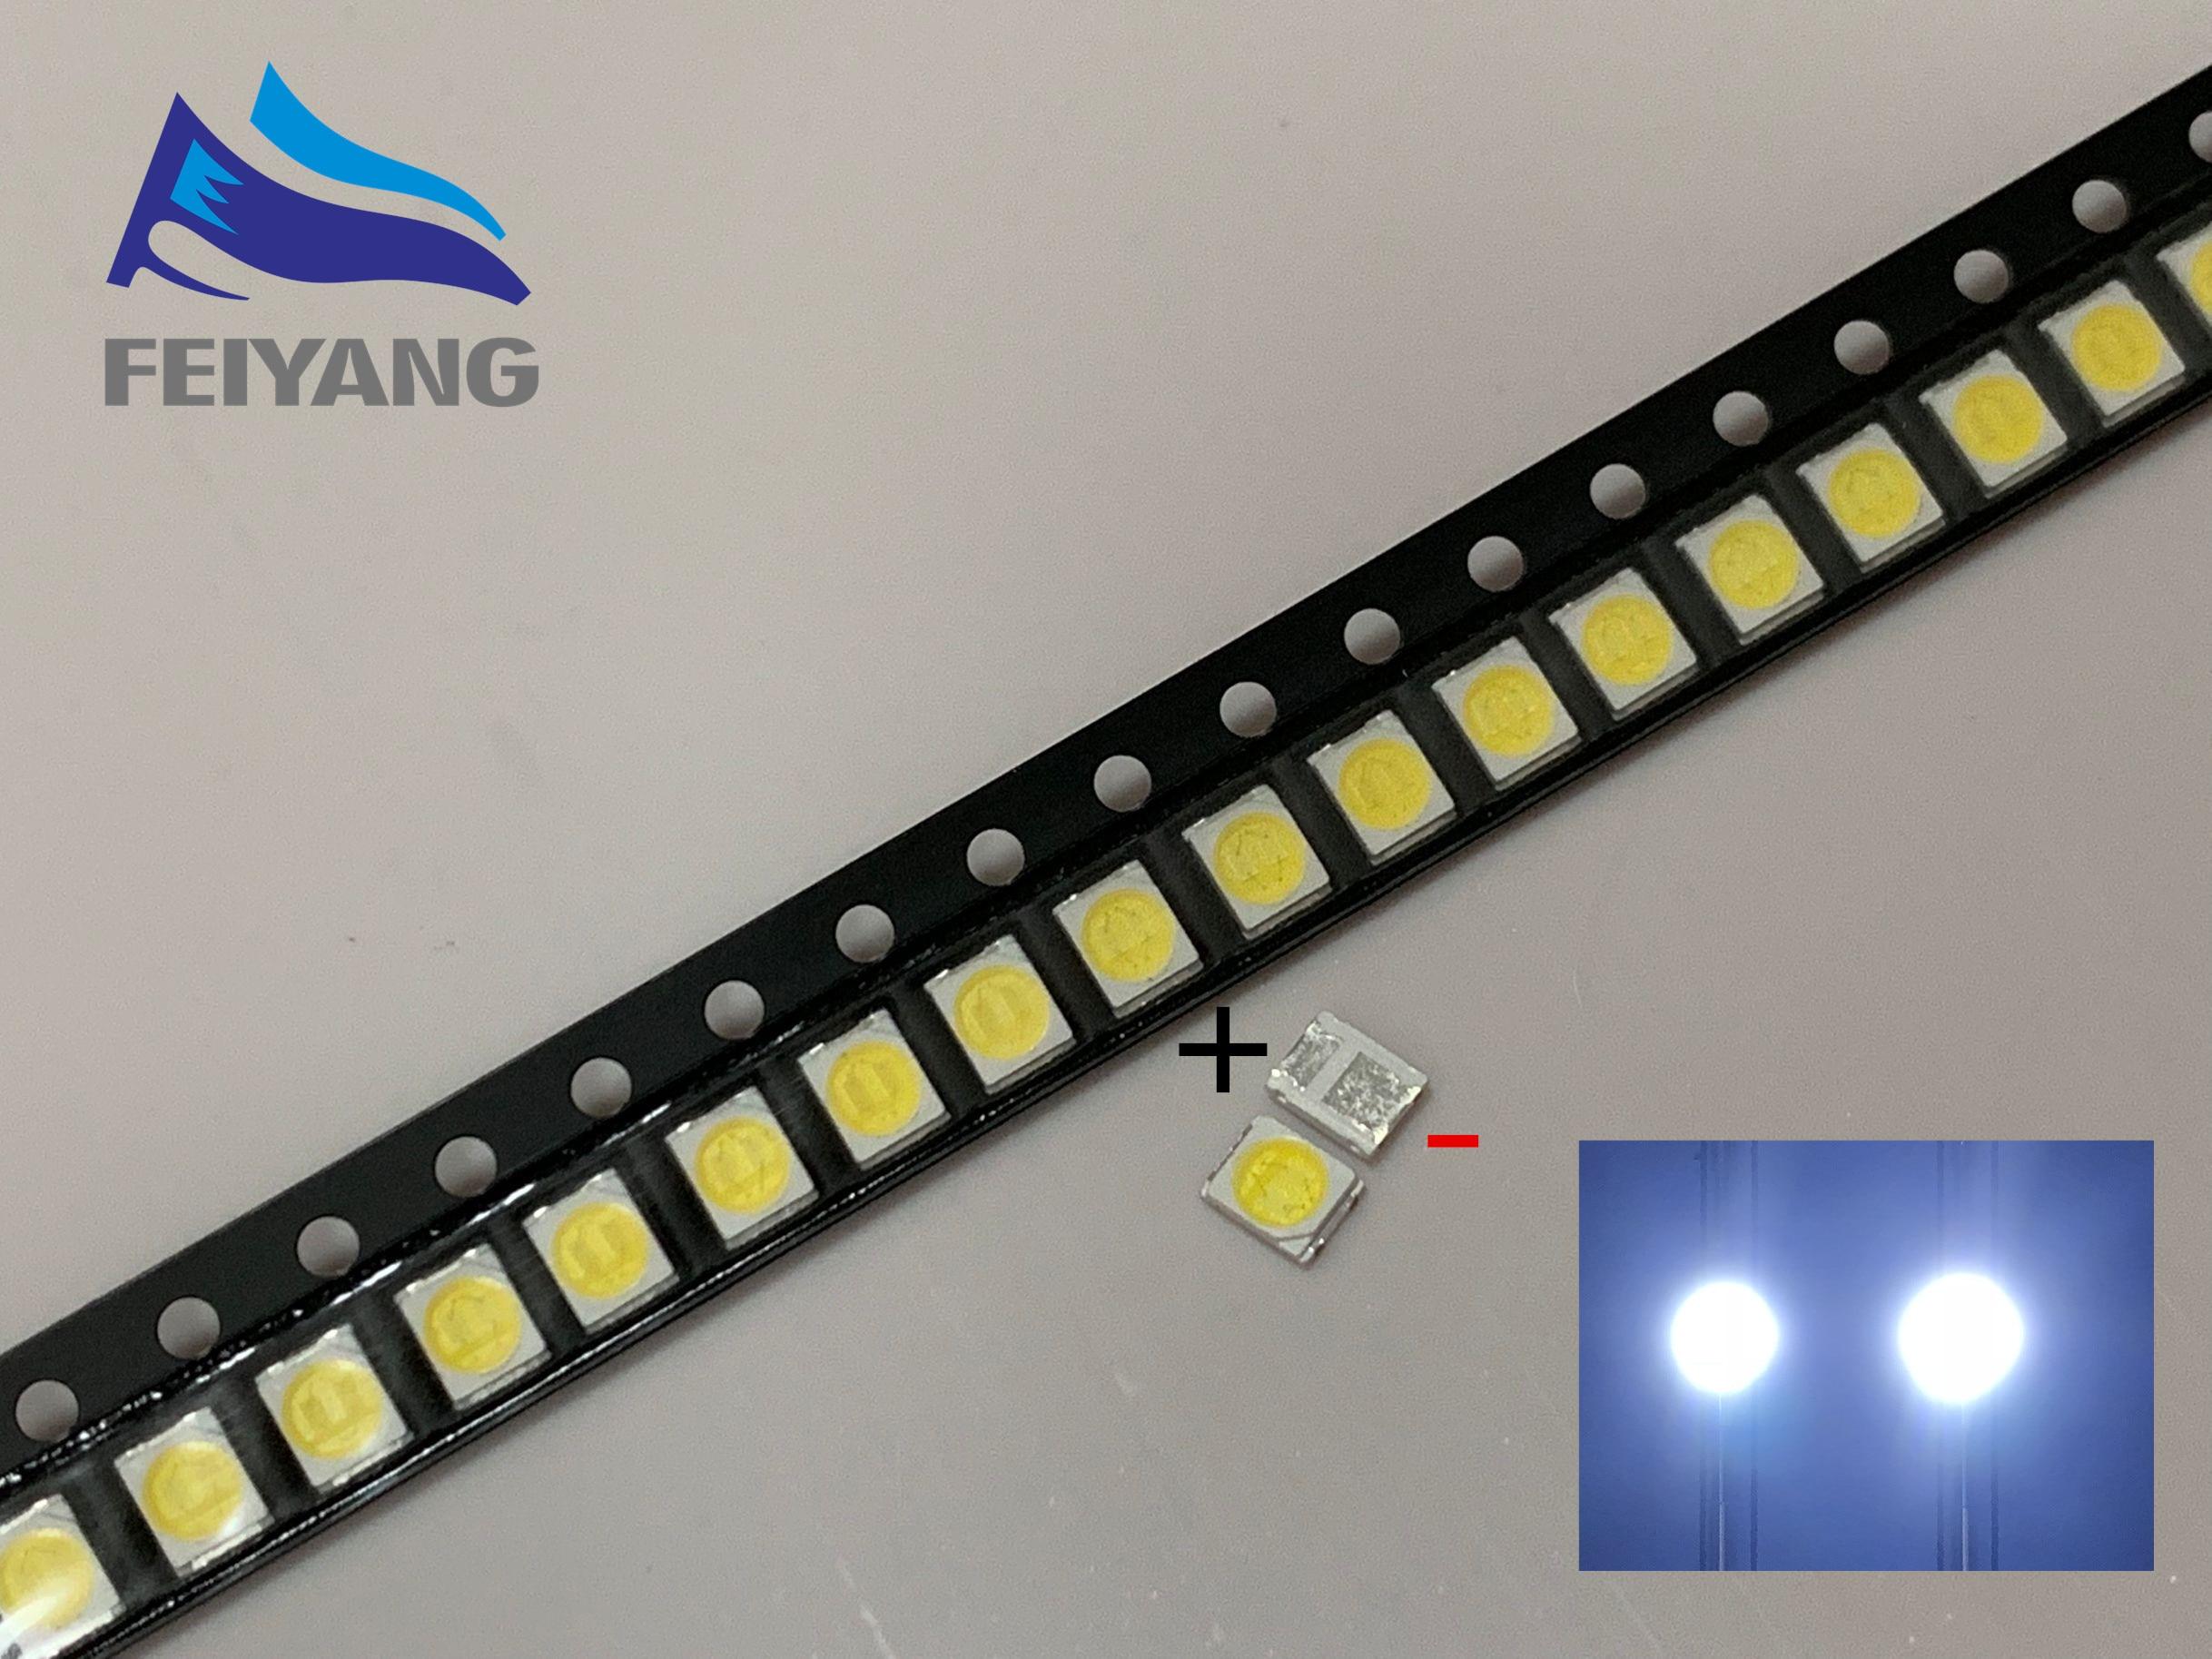 100Pcs 3528 SMD Lamp Beads 3V Specially for LG LED TV Backlight Strip,Repair TV